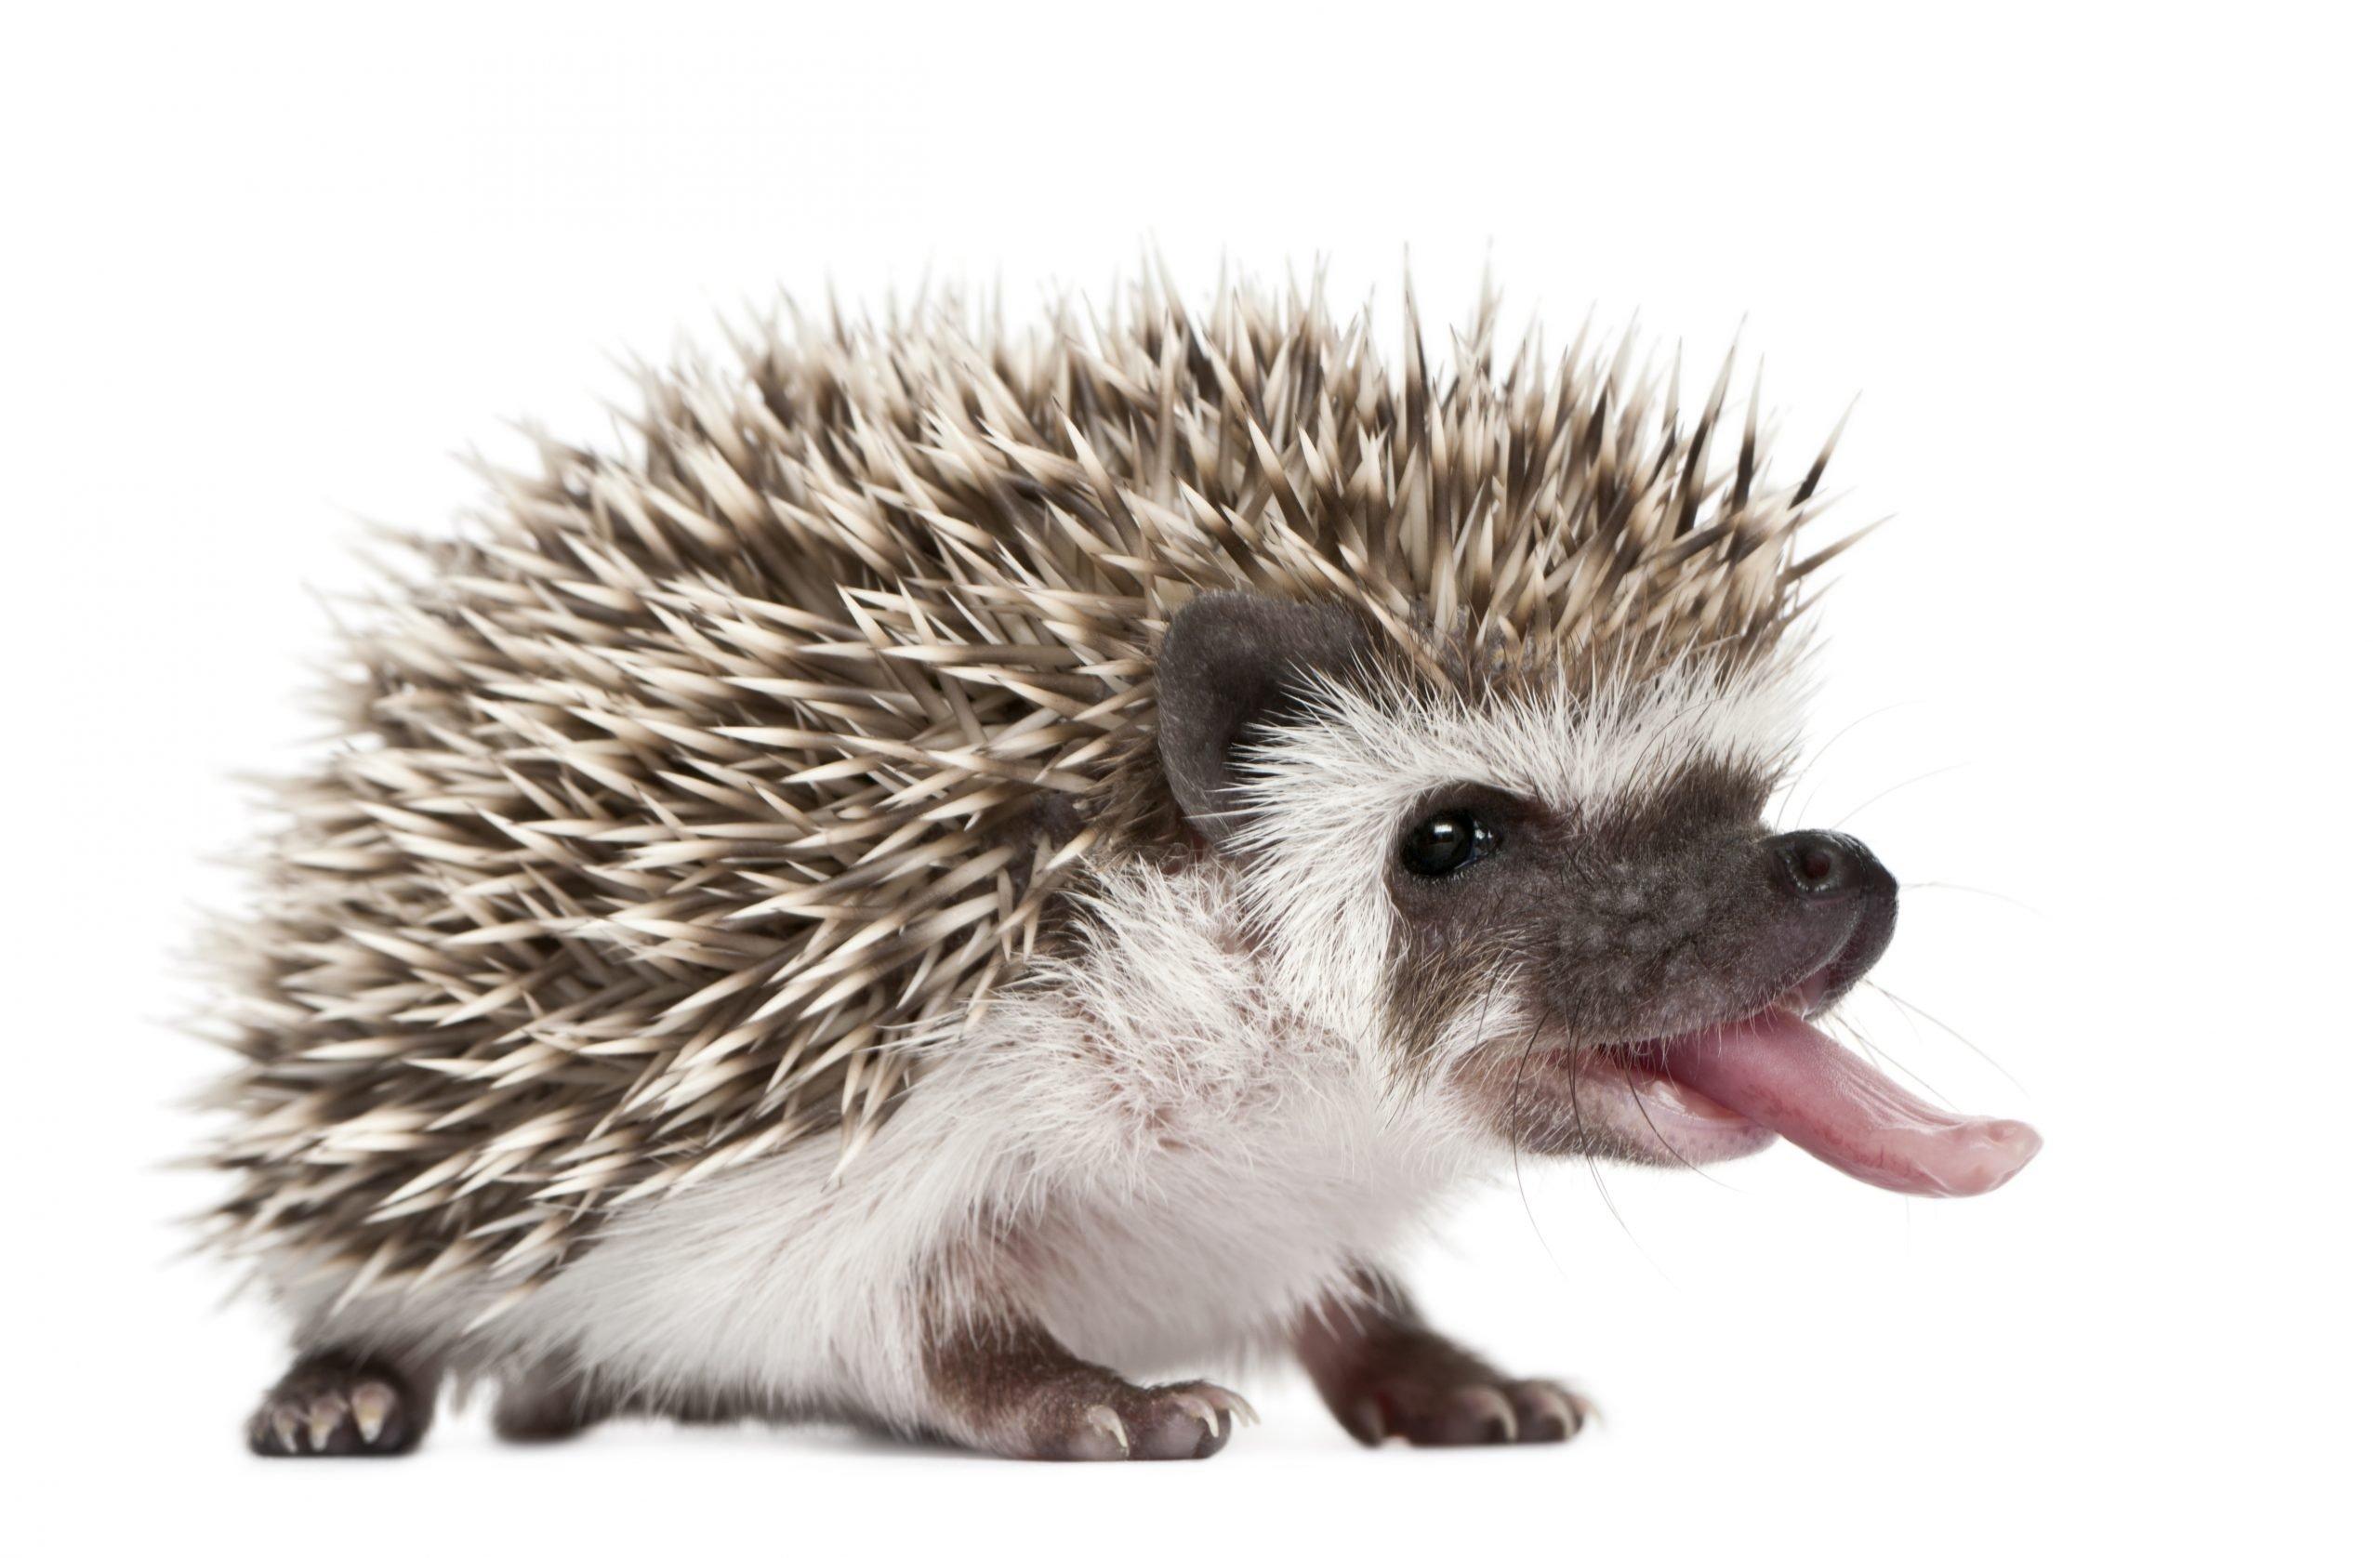 Four-toed Hedgehog - Atelerix albiventris (3 weeks